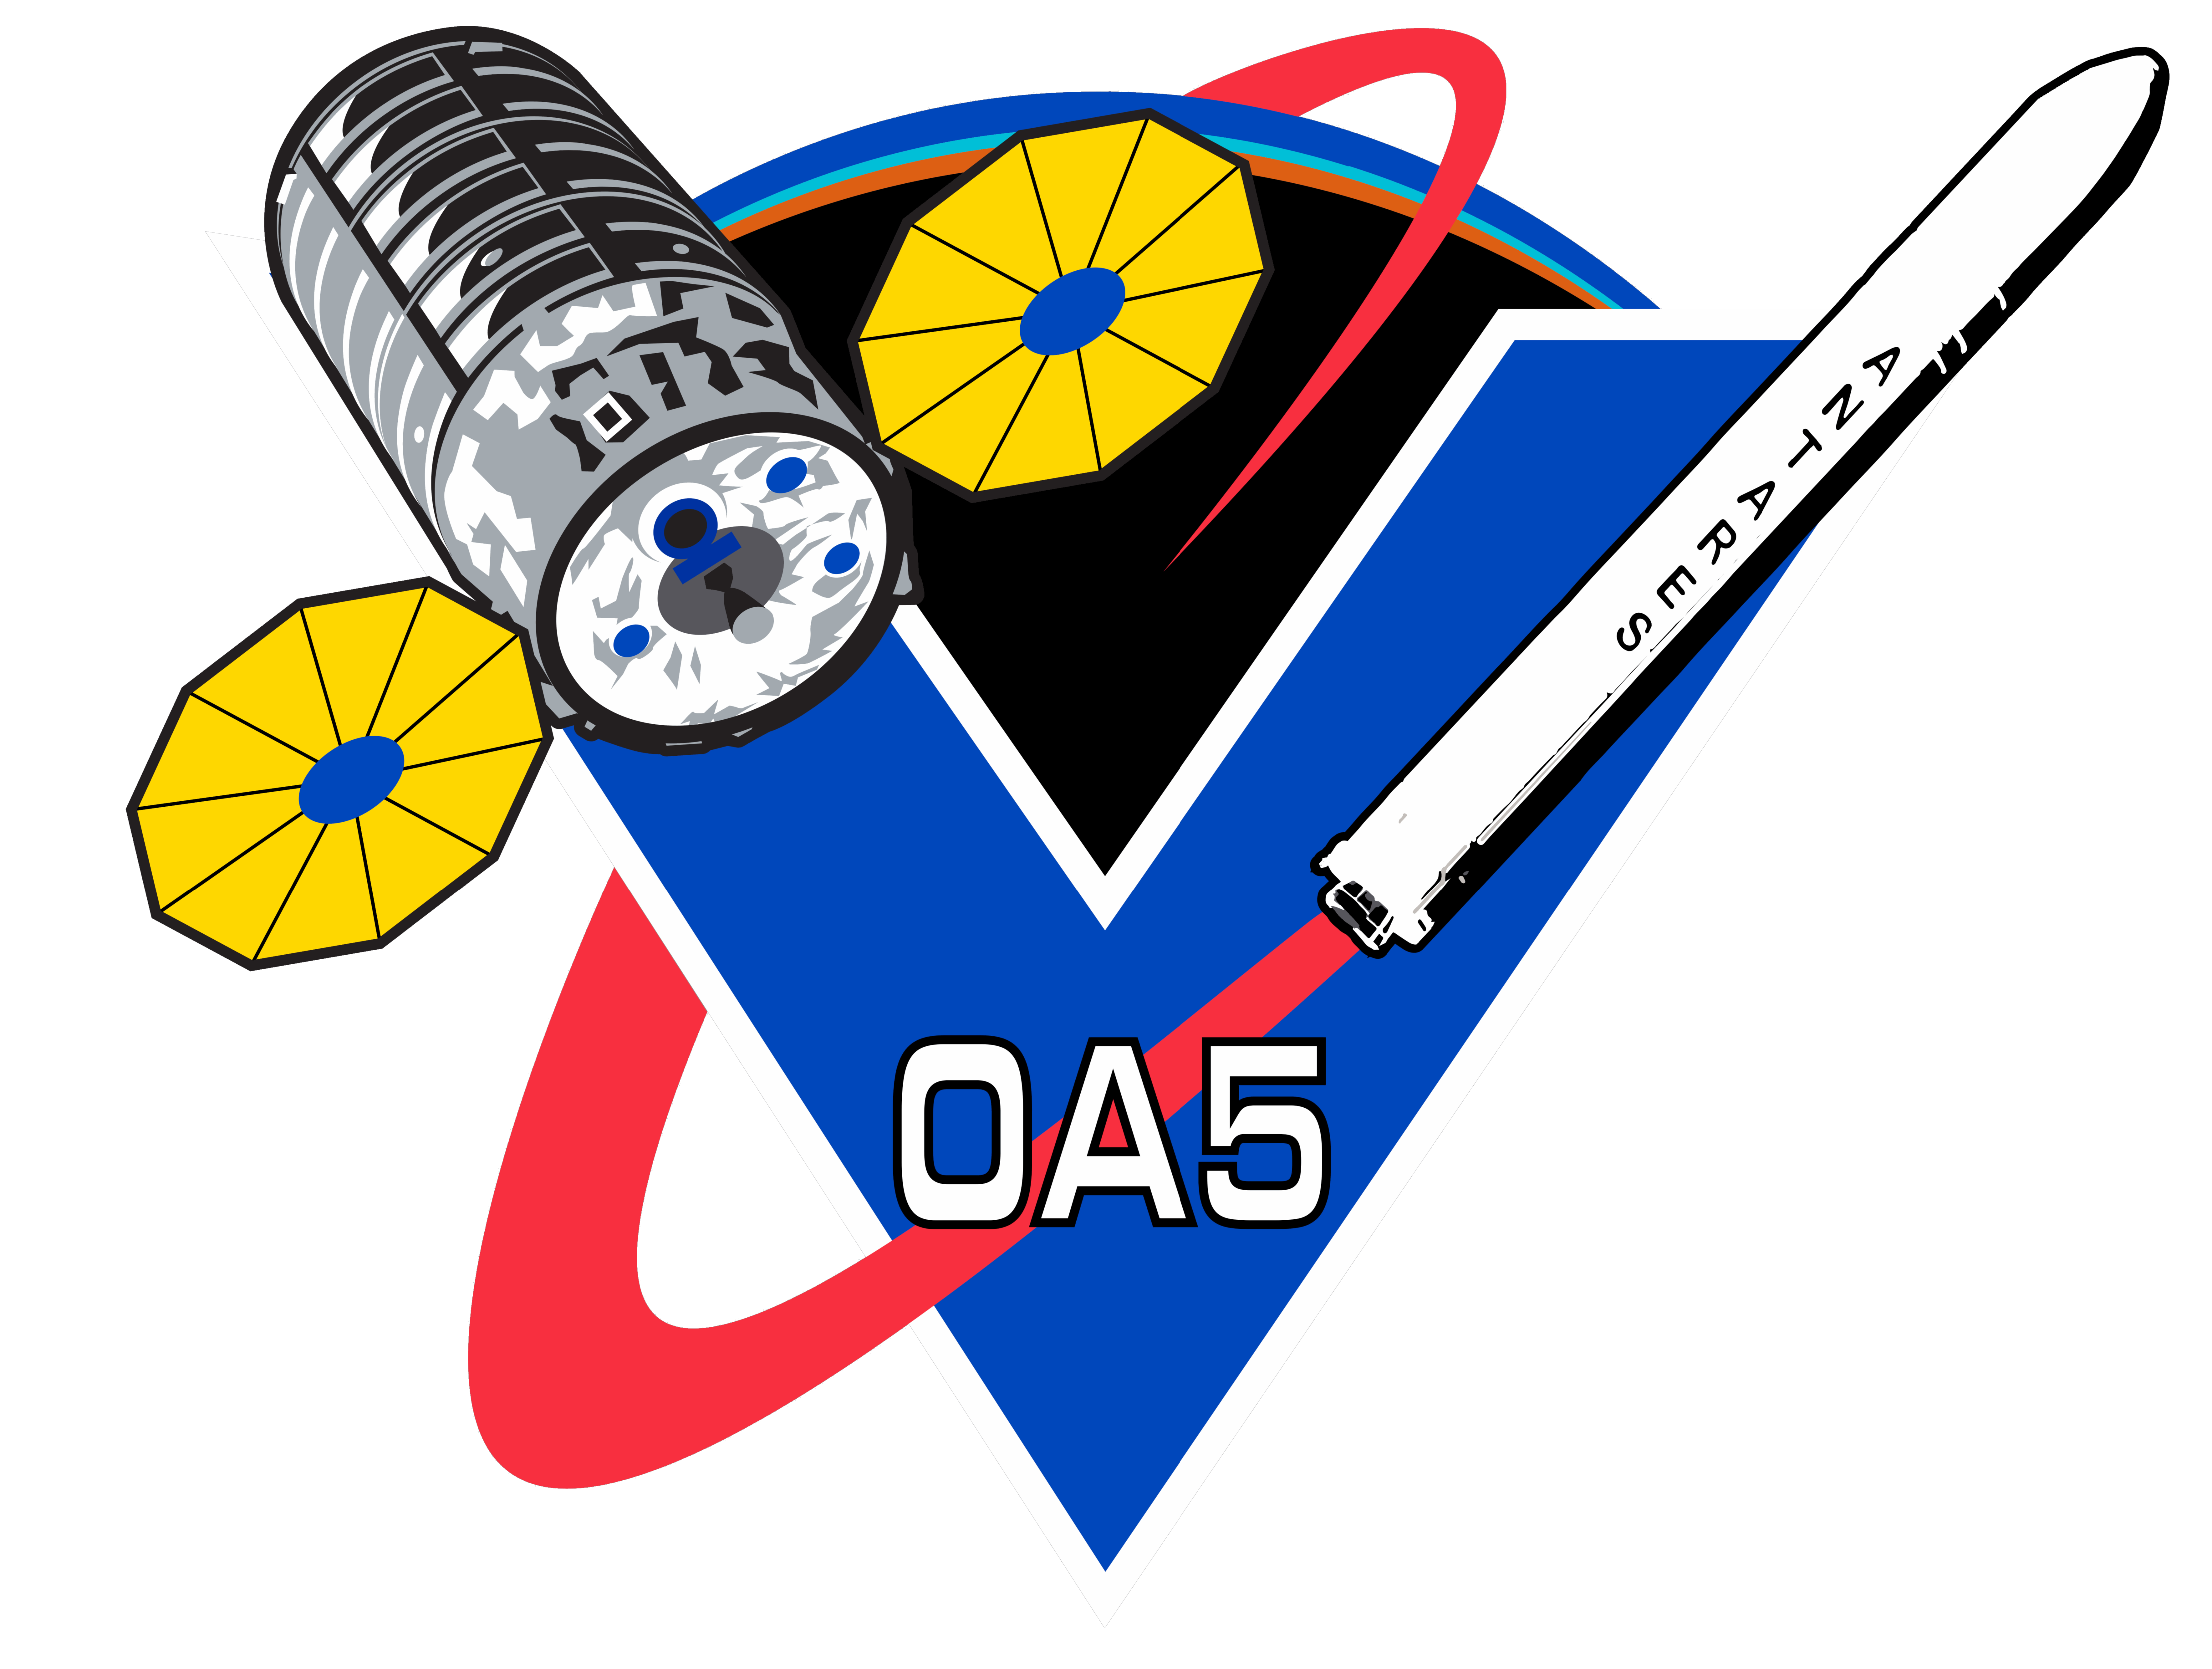 File:Orbital Sciences CRS Flight 5 Patch.png.